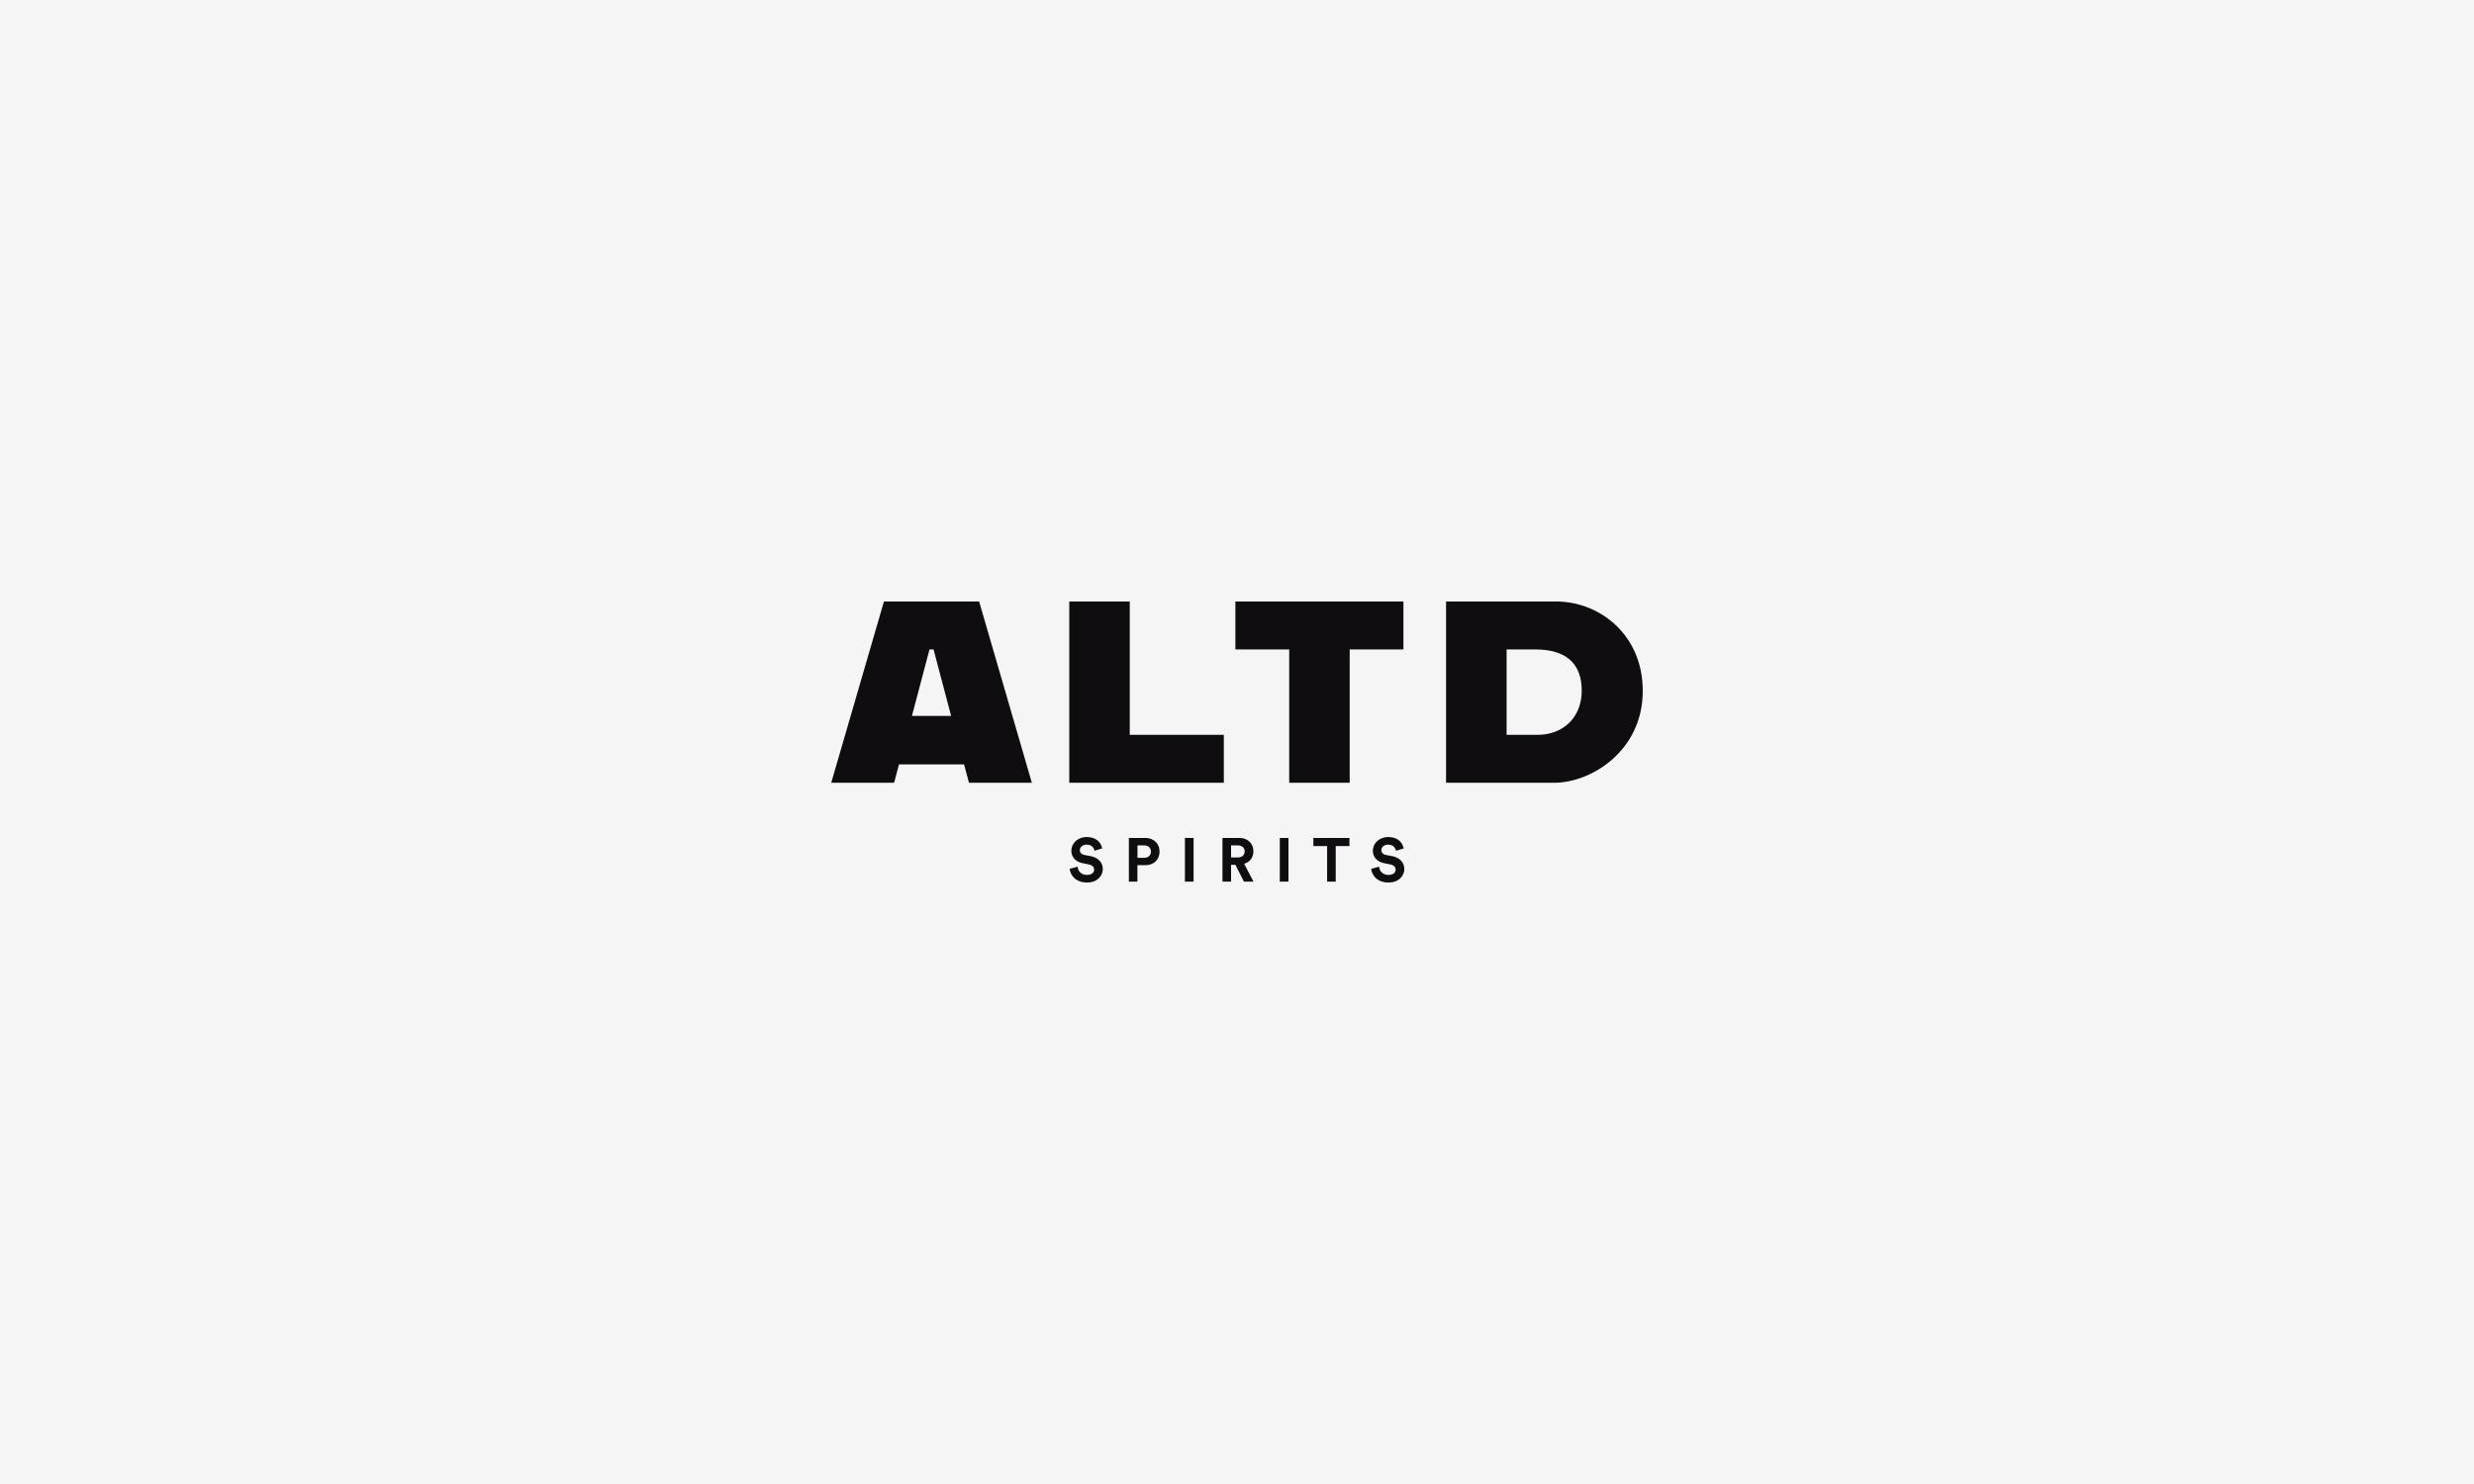 Nectar-&-Co-ALTD-Spirits-Logo.jpg